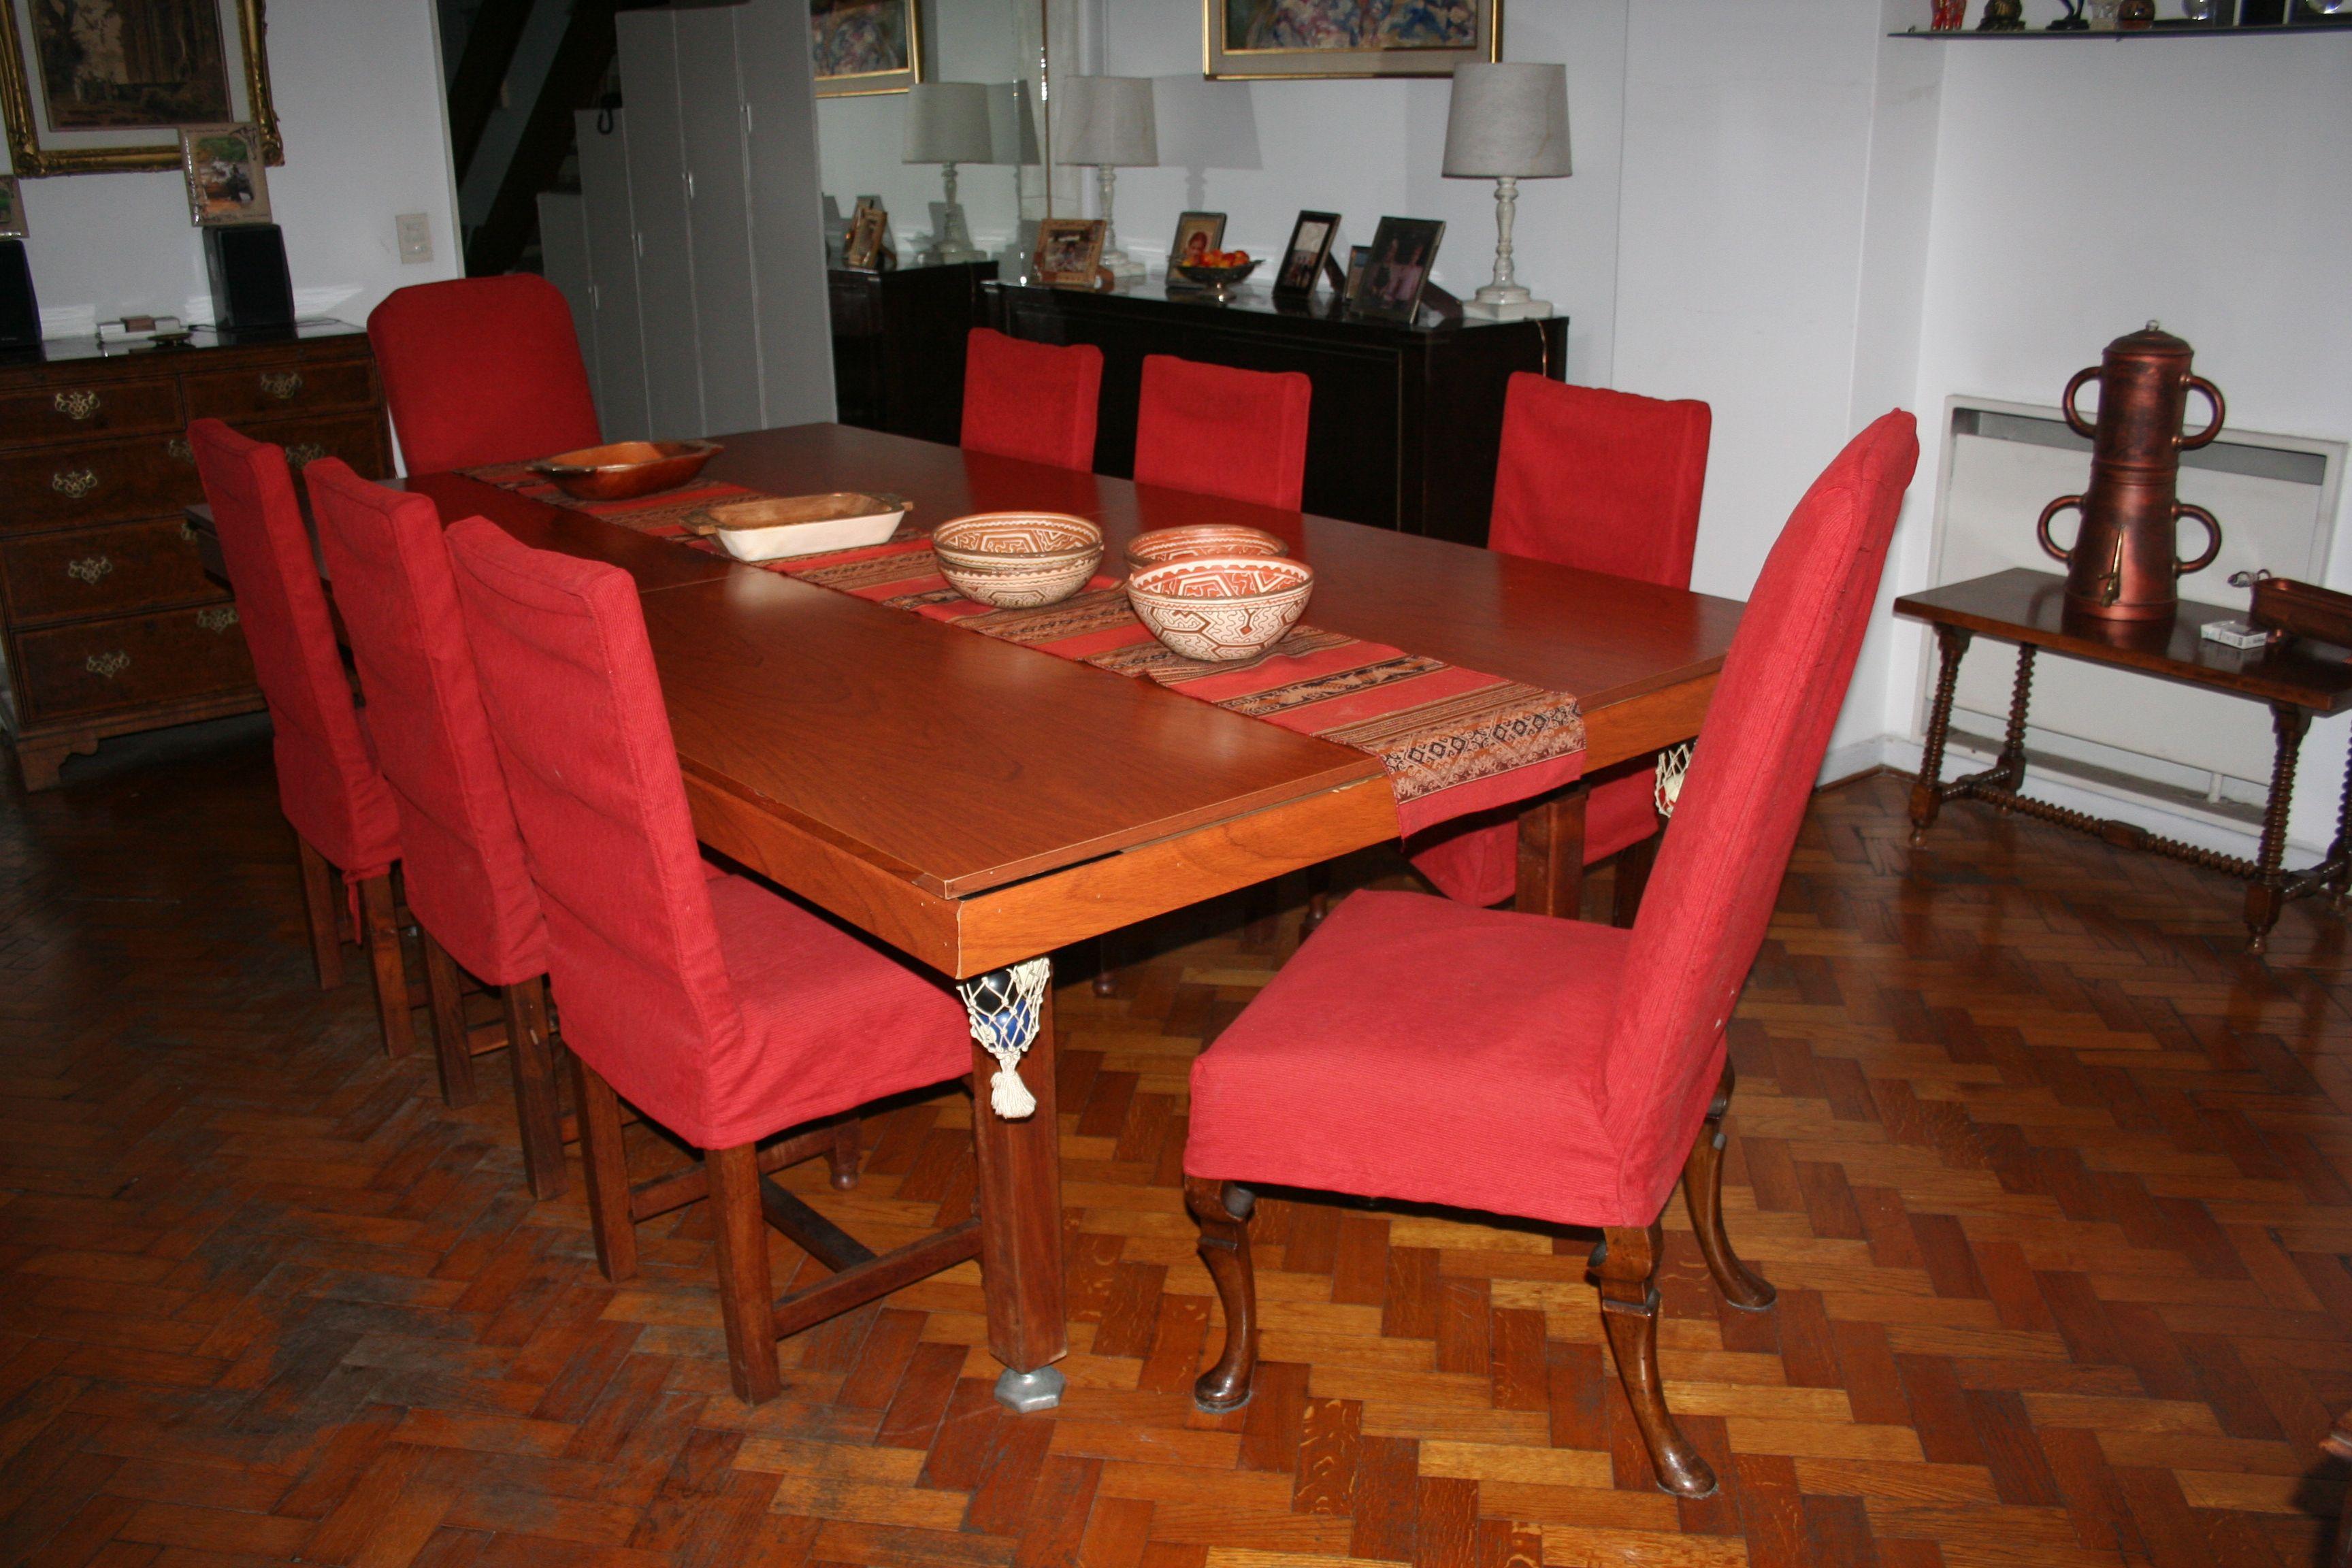 Dise o de comedor fundas de sillas para comedor y for Fundas sillas comedor carrefour